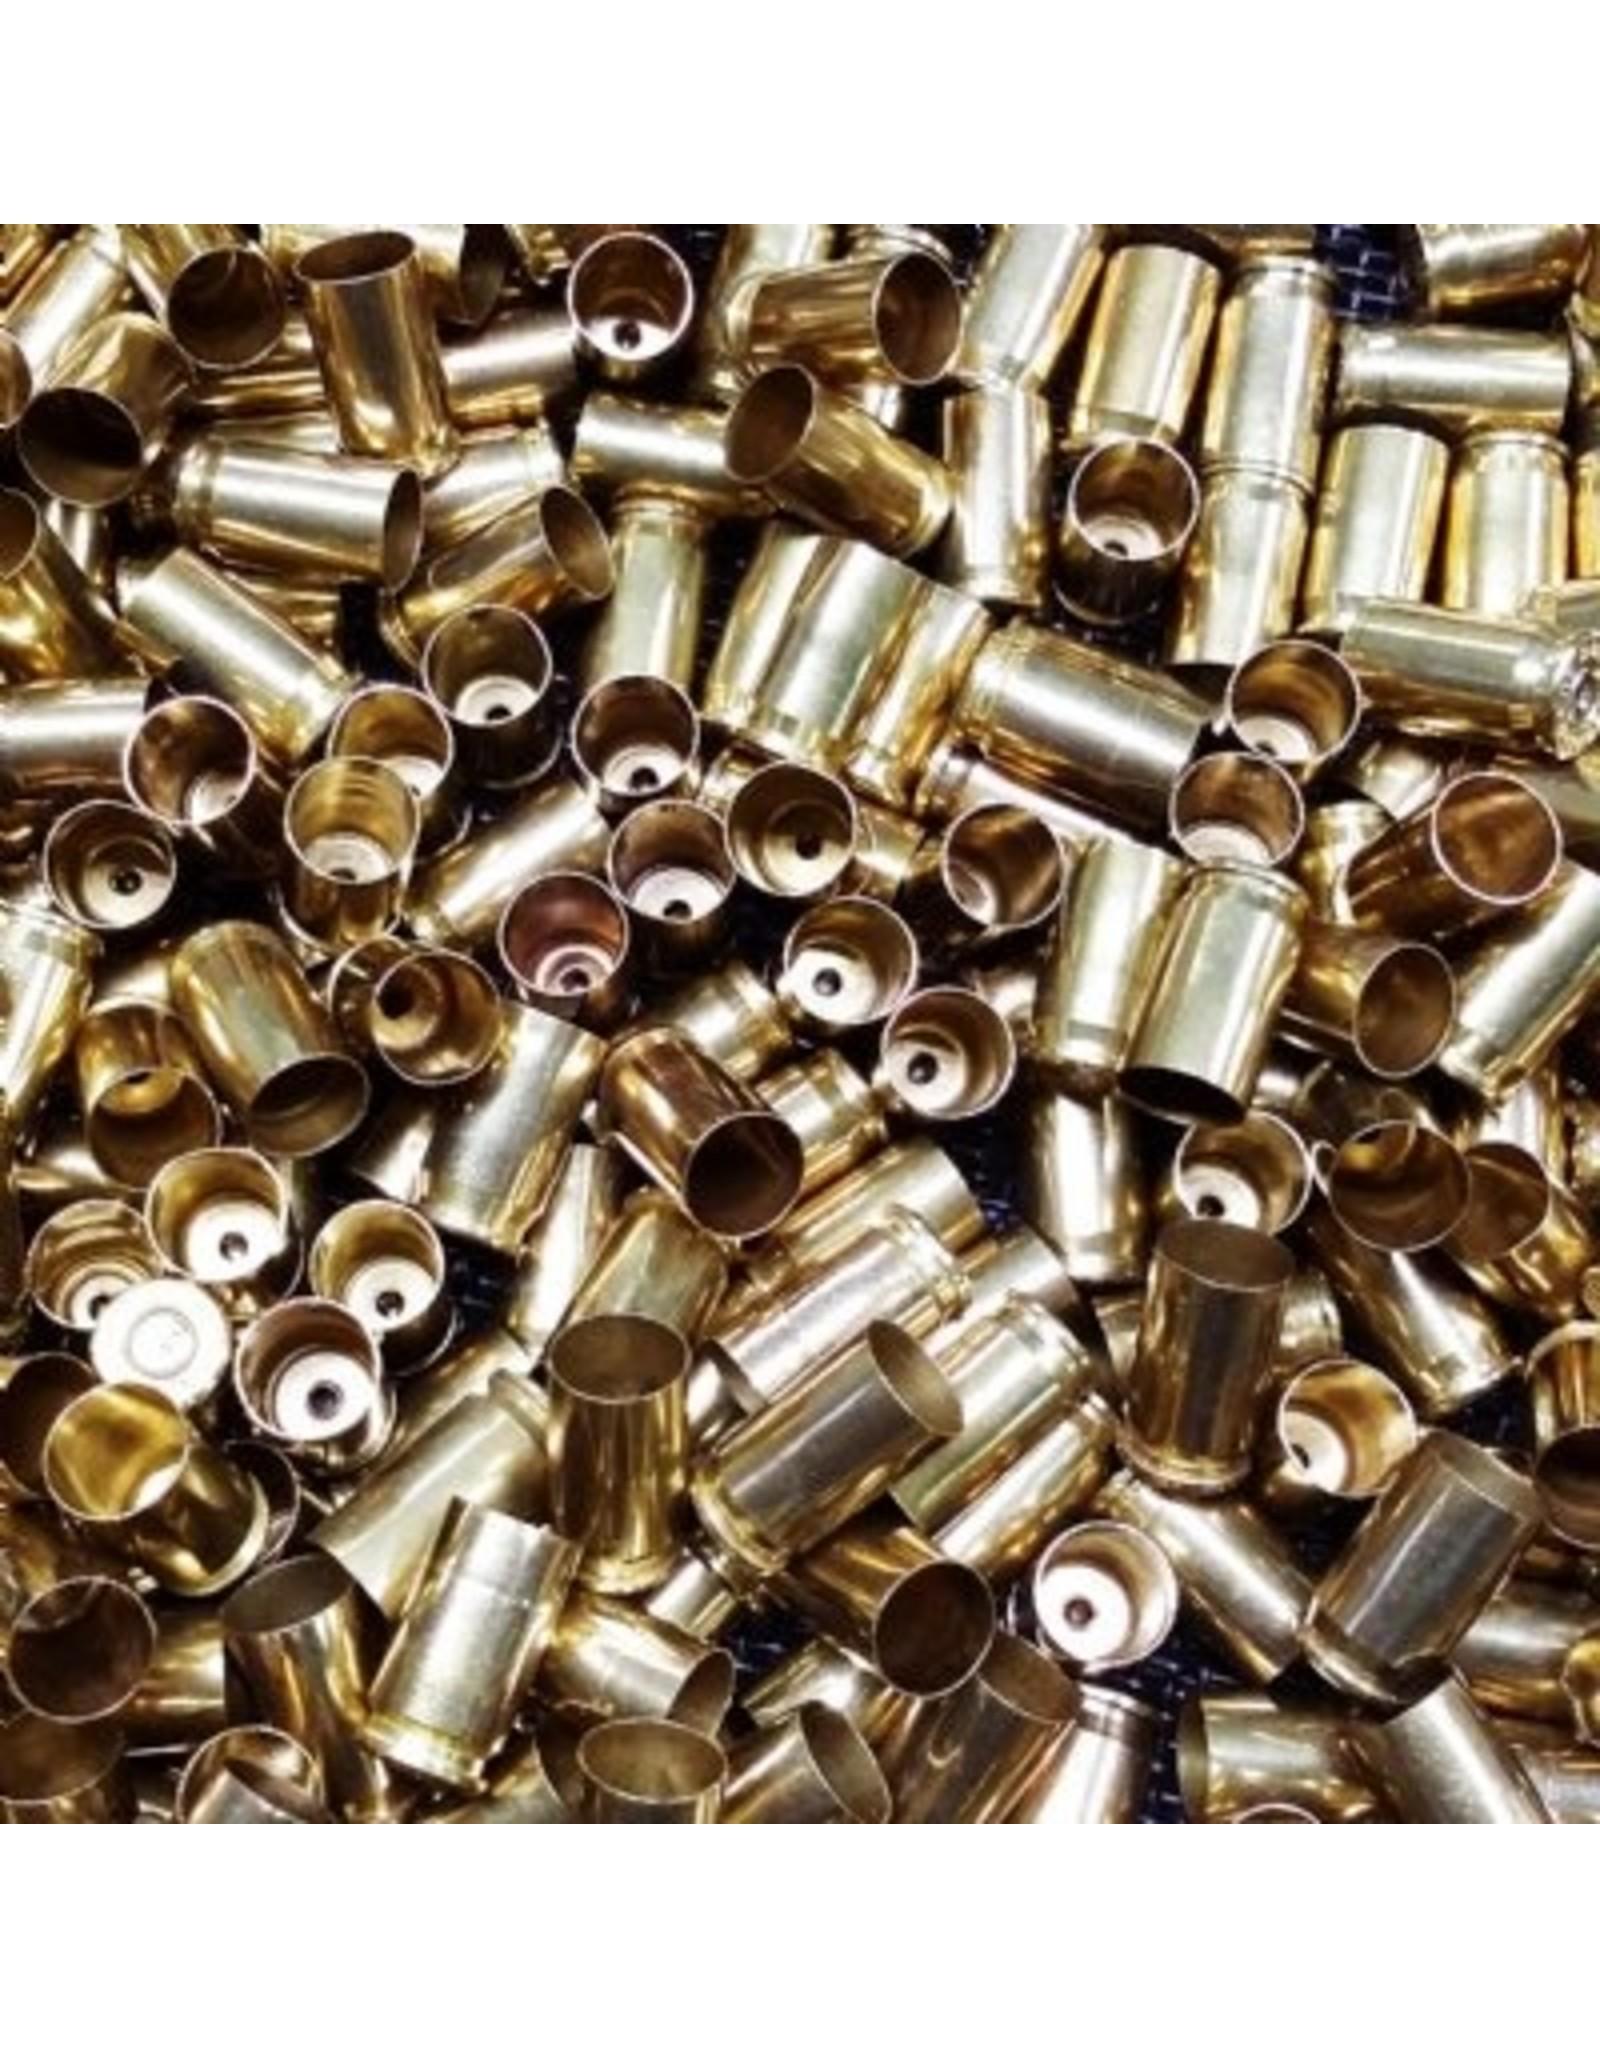 .35 Rem Brass - 50 Count